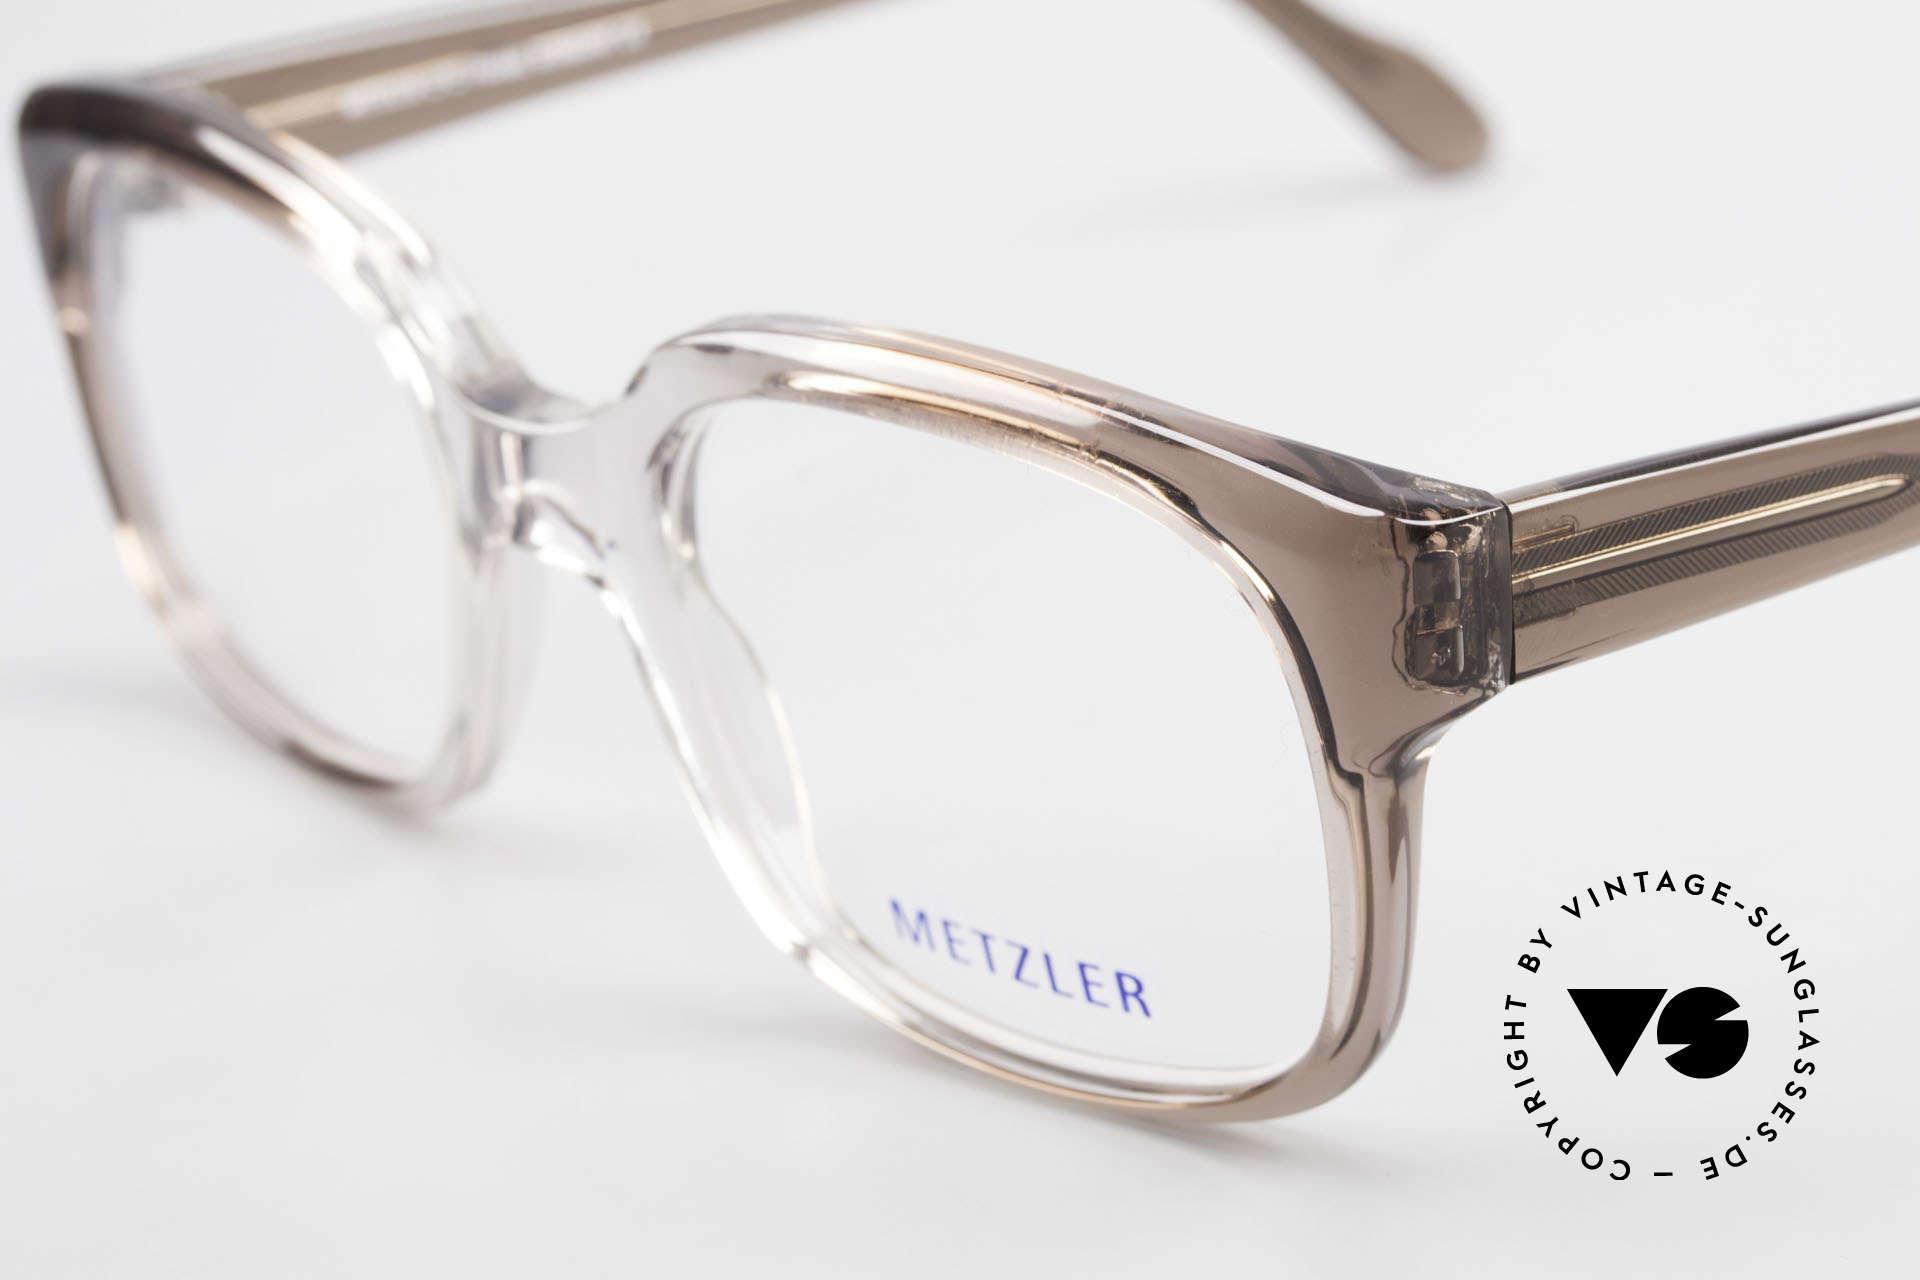 Metzler 7665 Medium Old School Eyeglasses 80's, unworn (like all our rare vintage eyeglass-frames), Made for Men